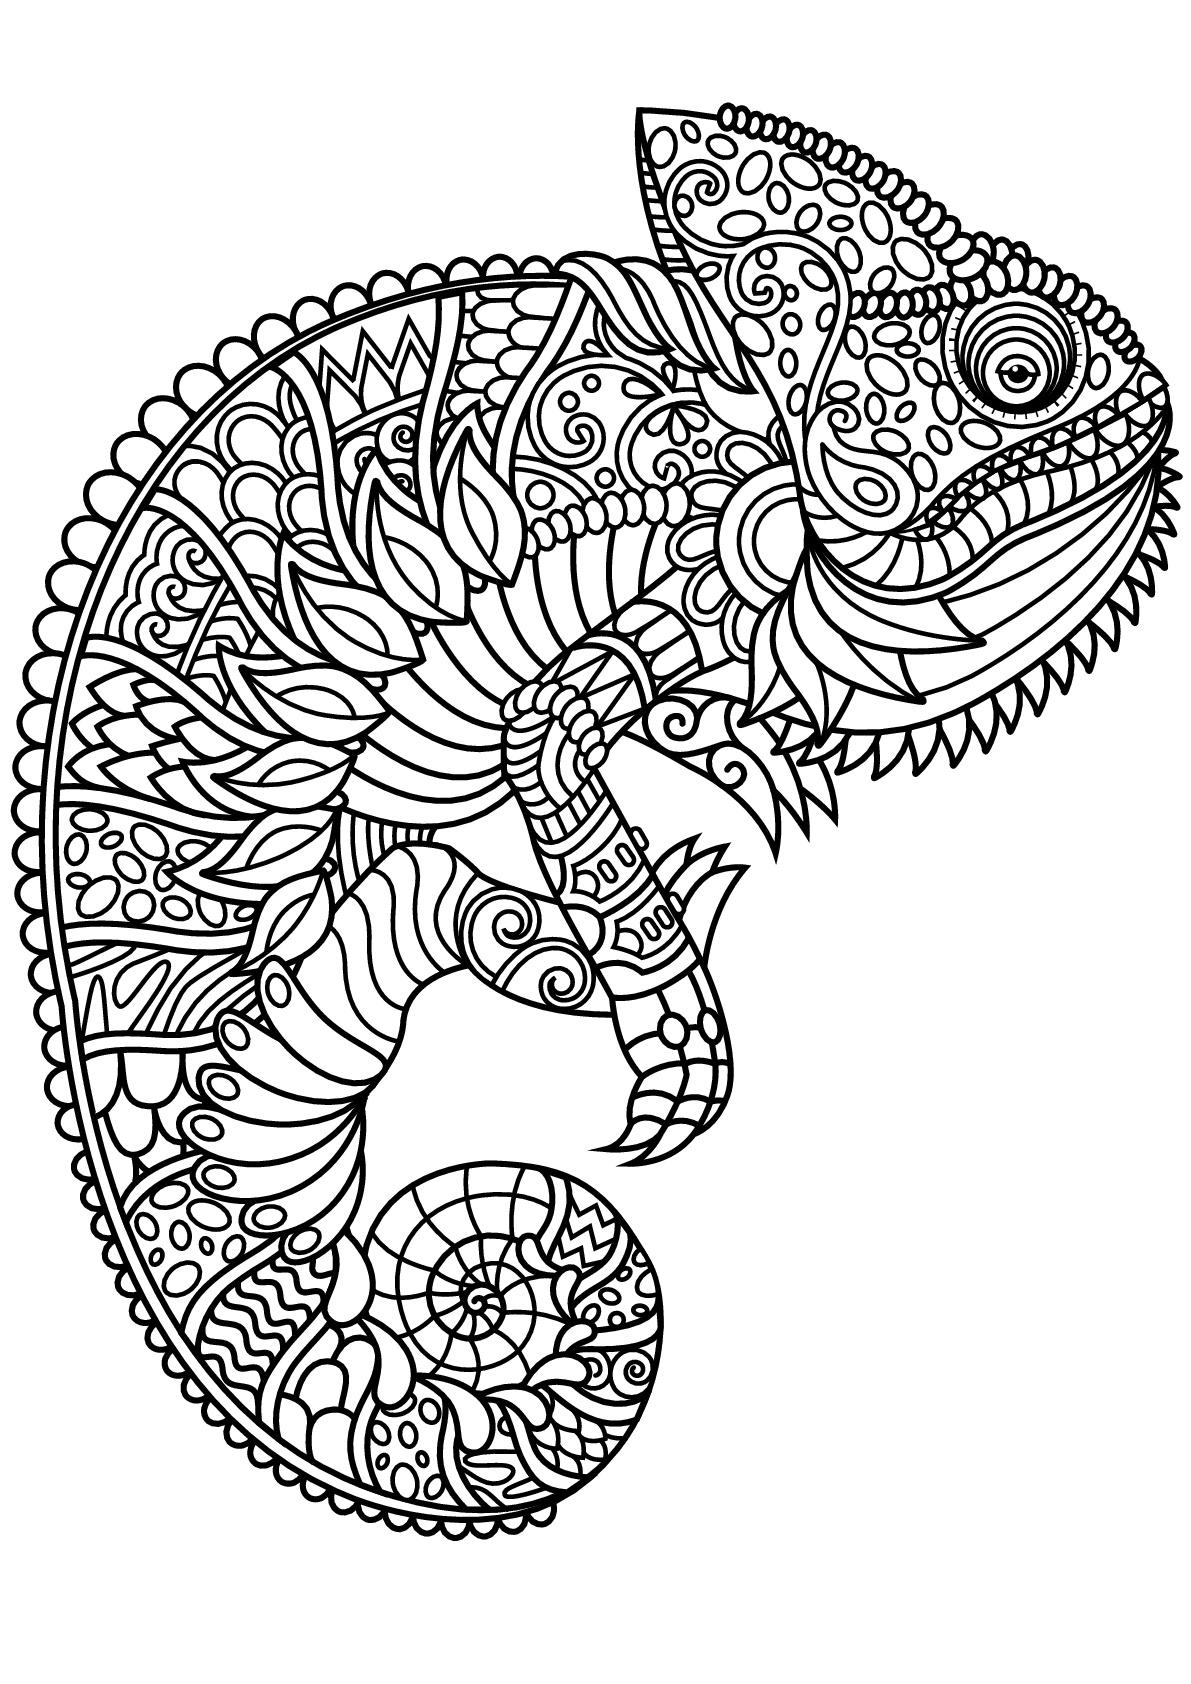 Camaleones y lagartos 35367 - Camaleones Y Lagartos ...